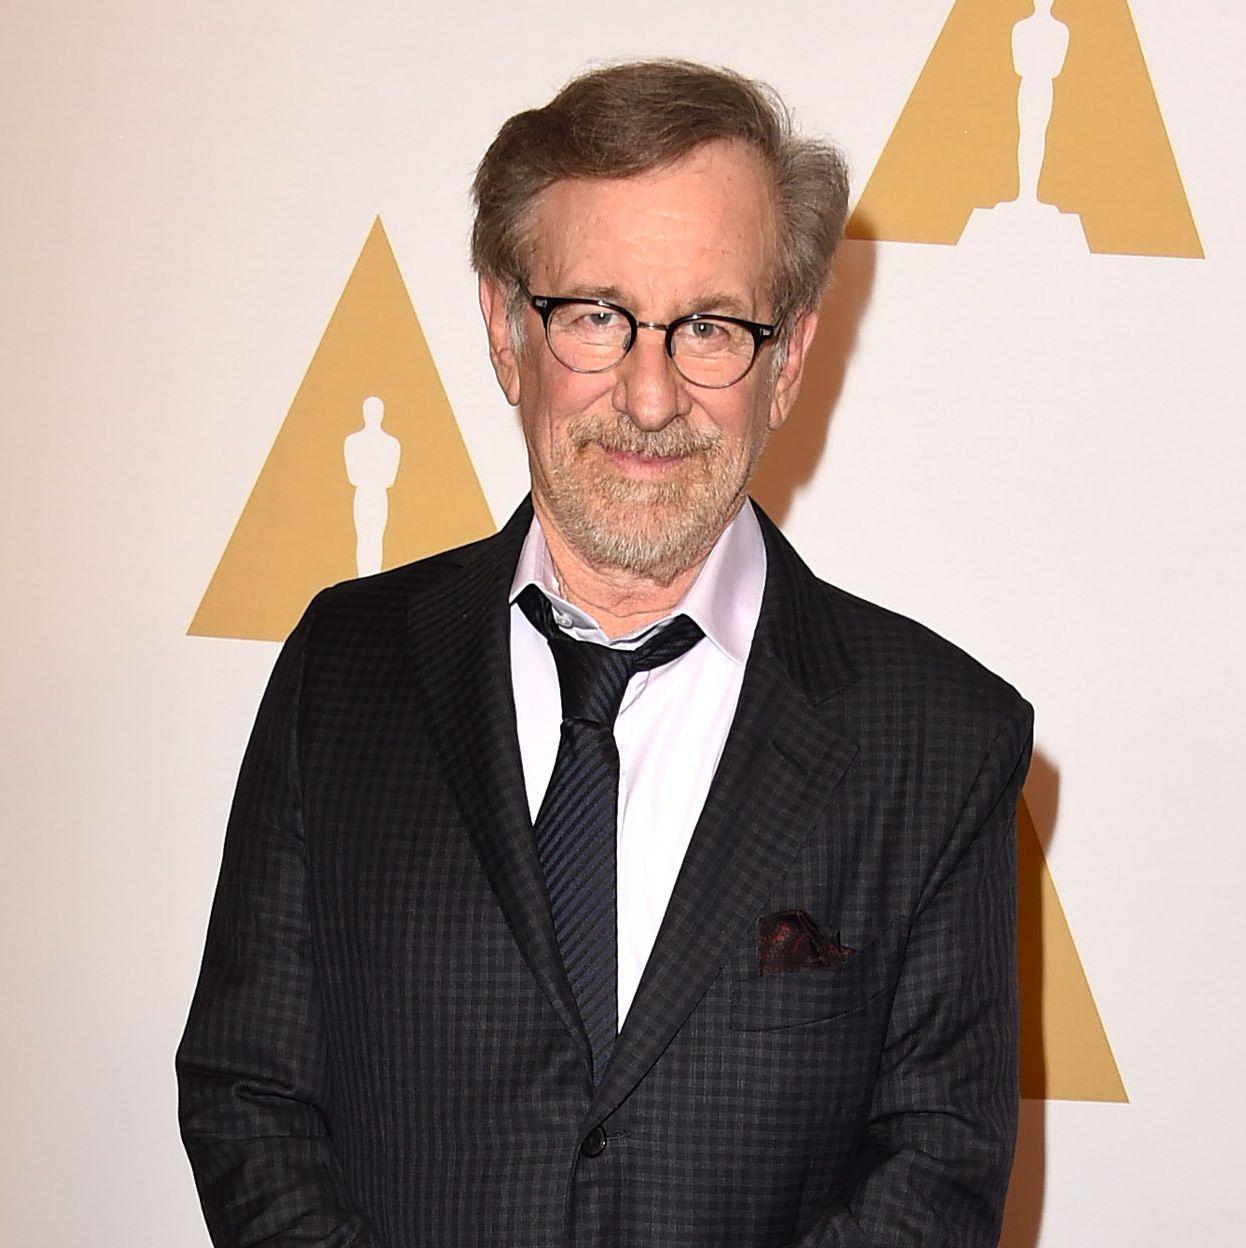 Netflix releases powerful statement following Steven Spielberg criticism